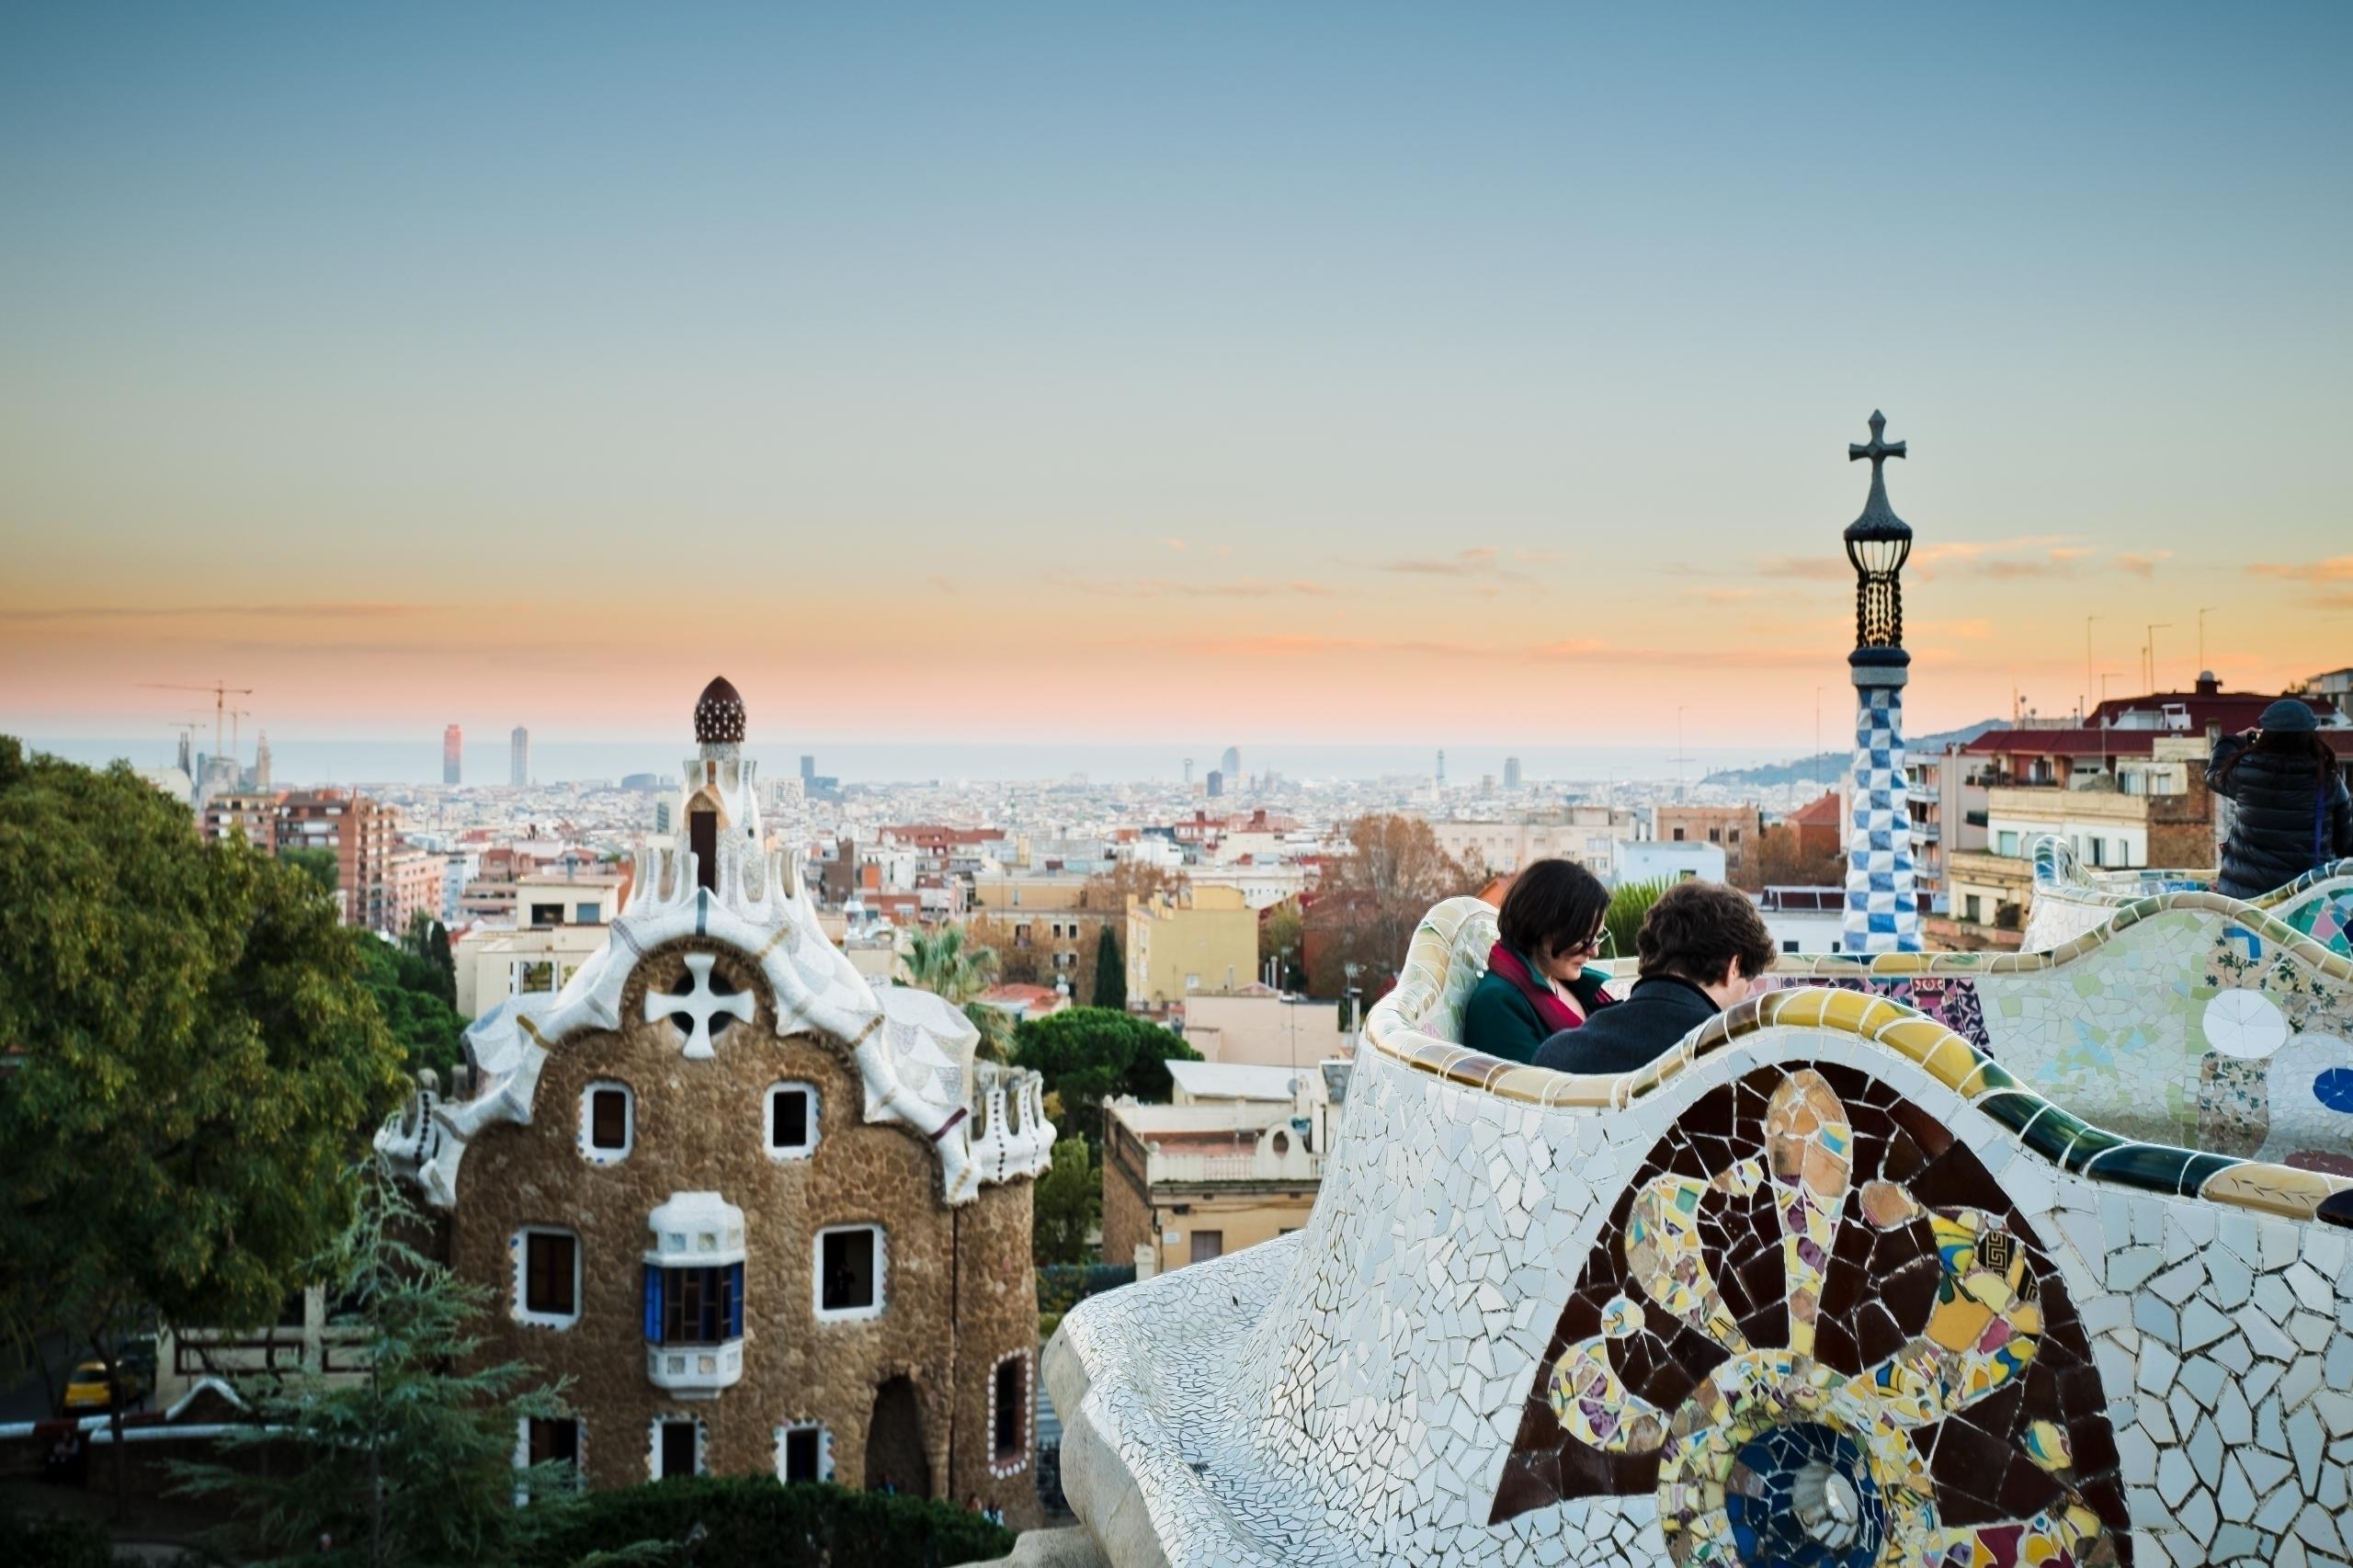 Sunset Park Guell. Barcelona, S - nickdelrosario | ello